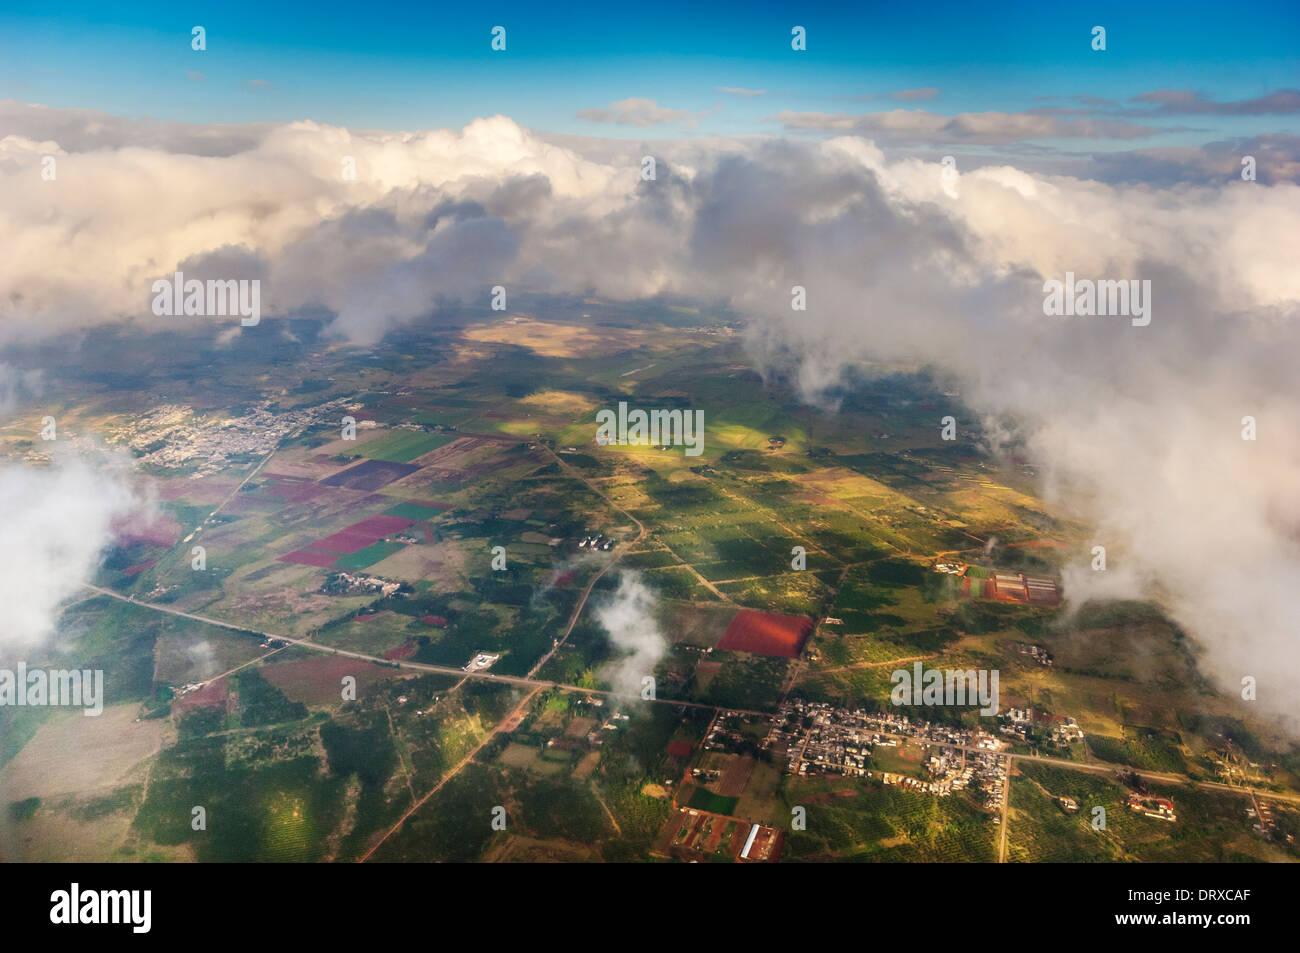 havana cuba aerial shot - Stock Image